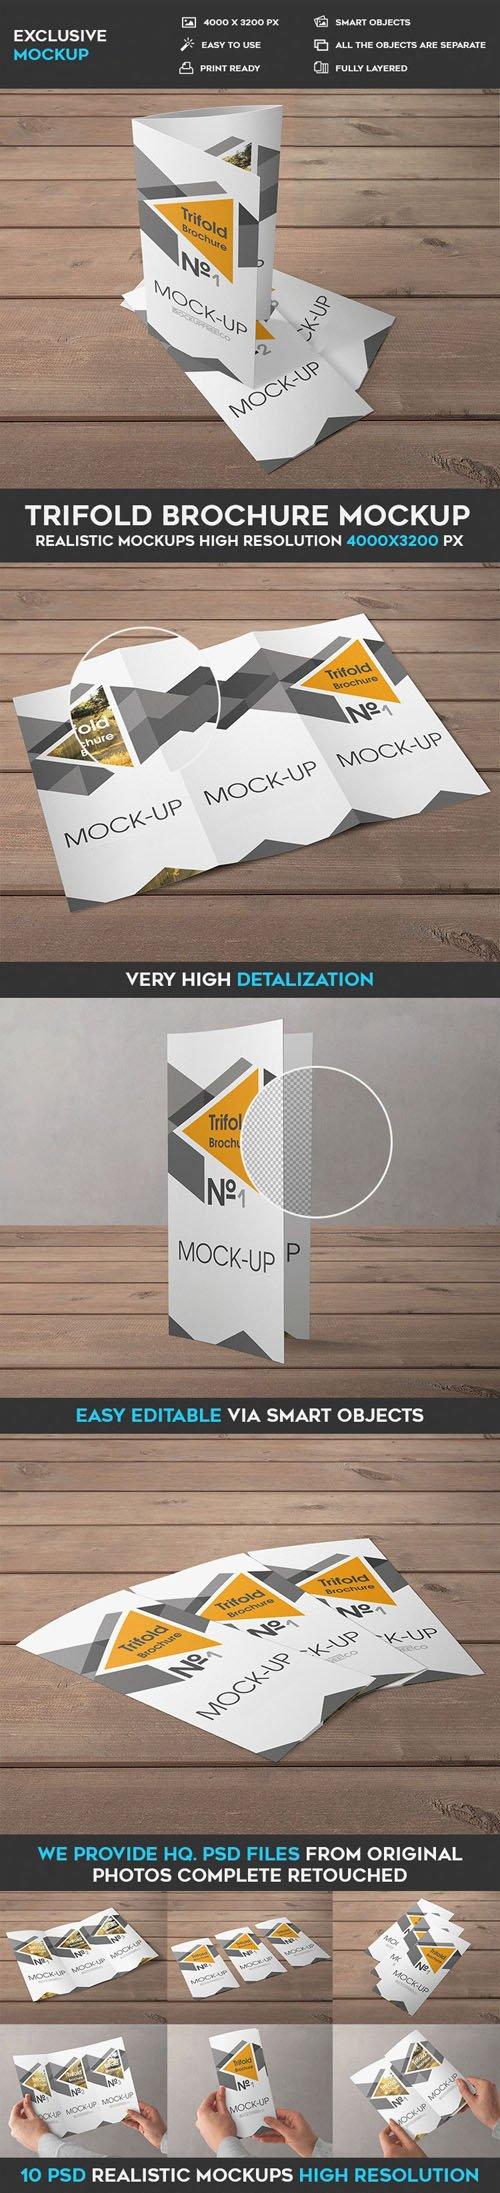 Trifold Brochure - 10 PSD Mockups